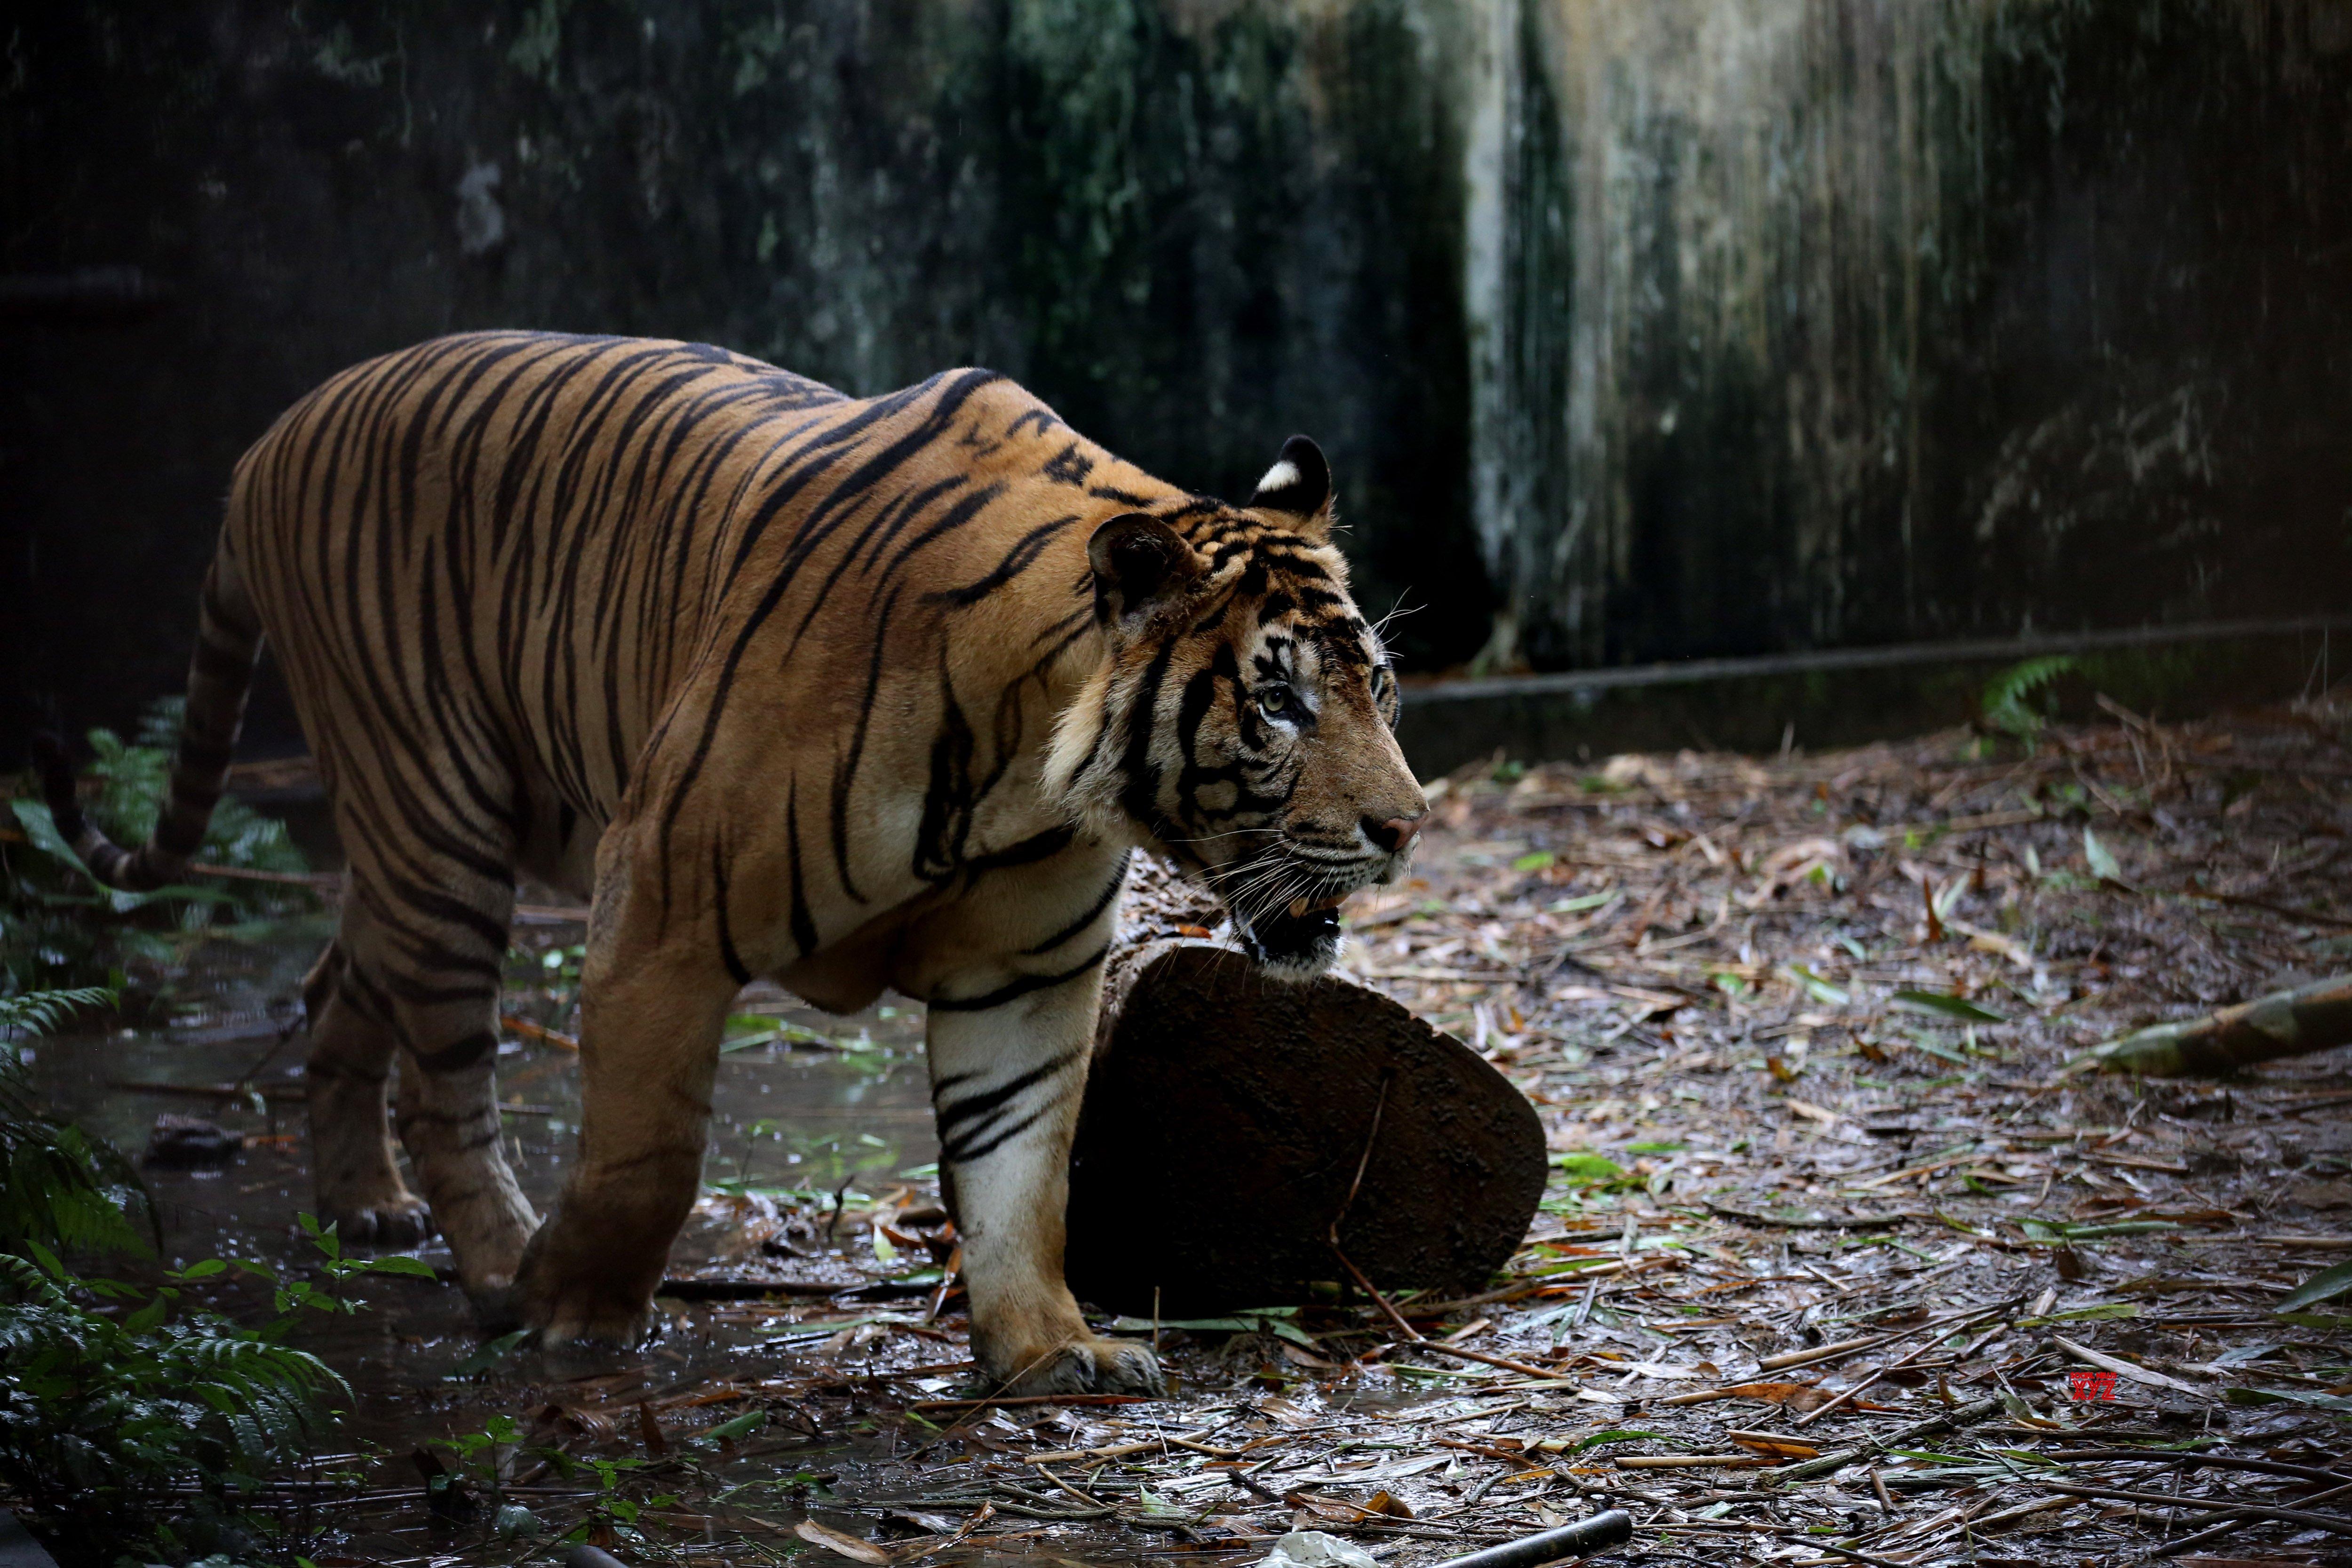 No sign of killer tiger in Karnataka's Bandipur forest